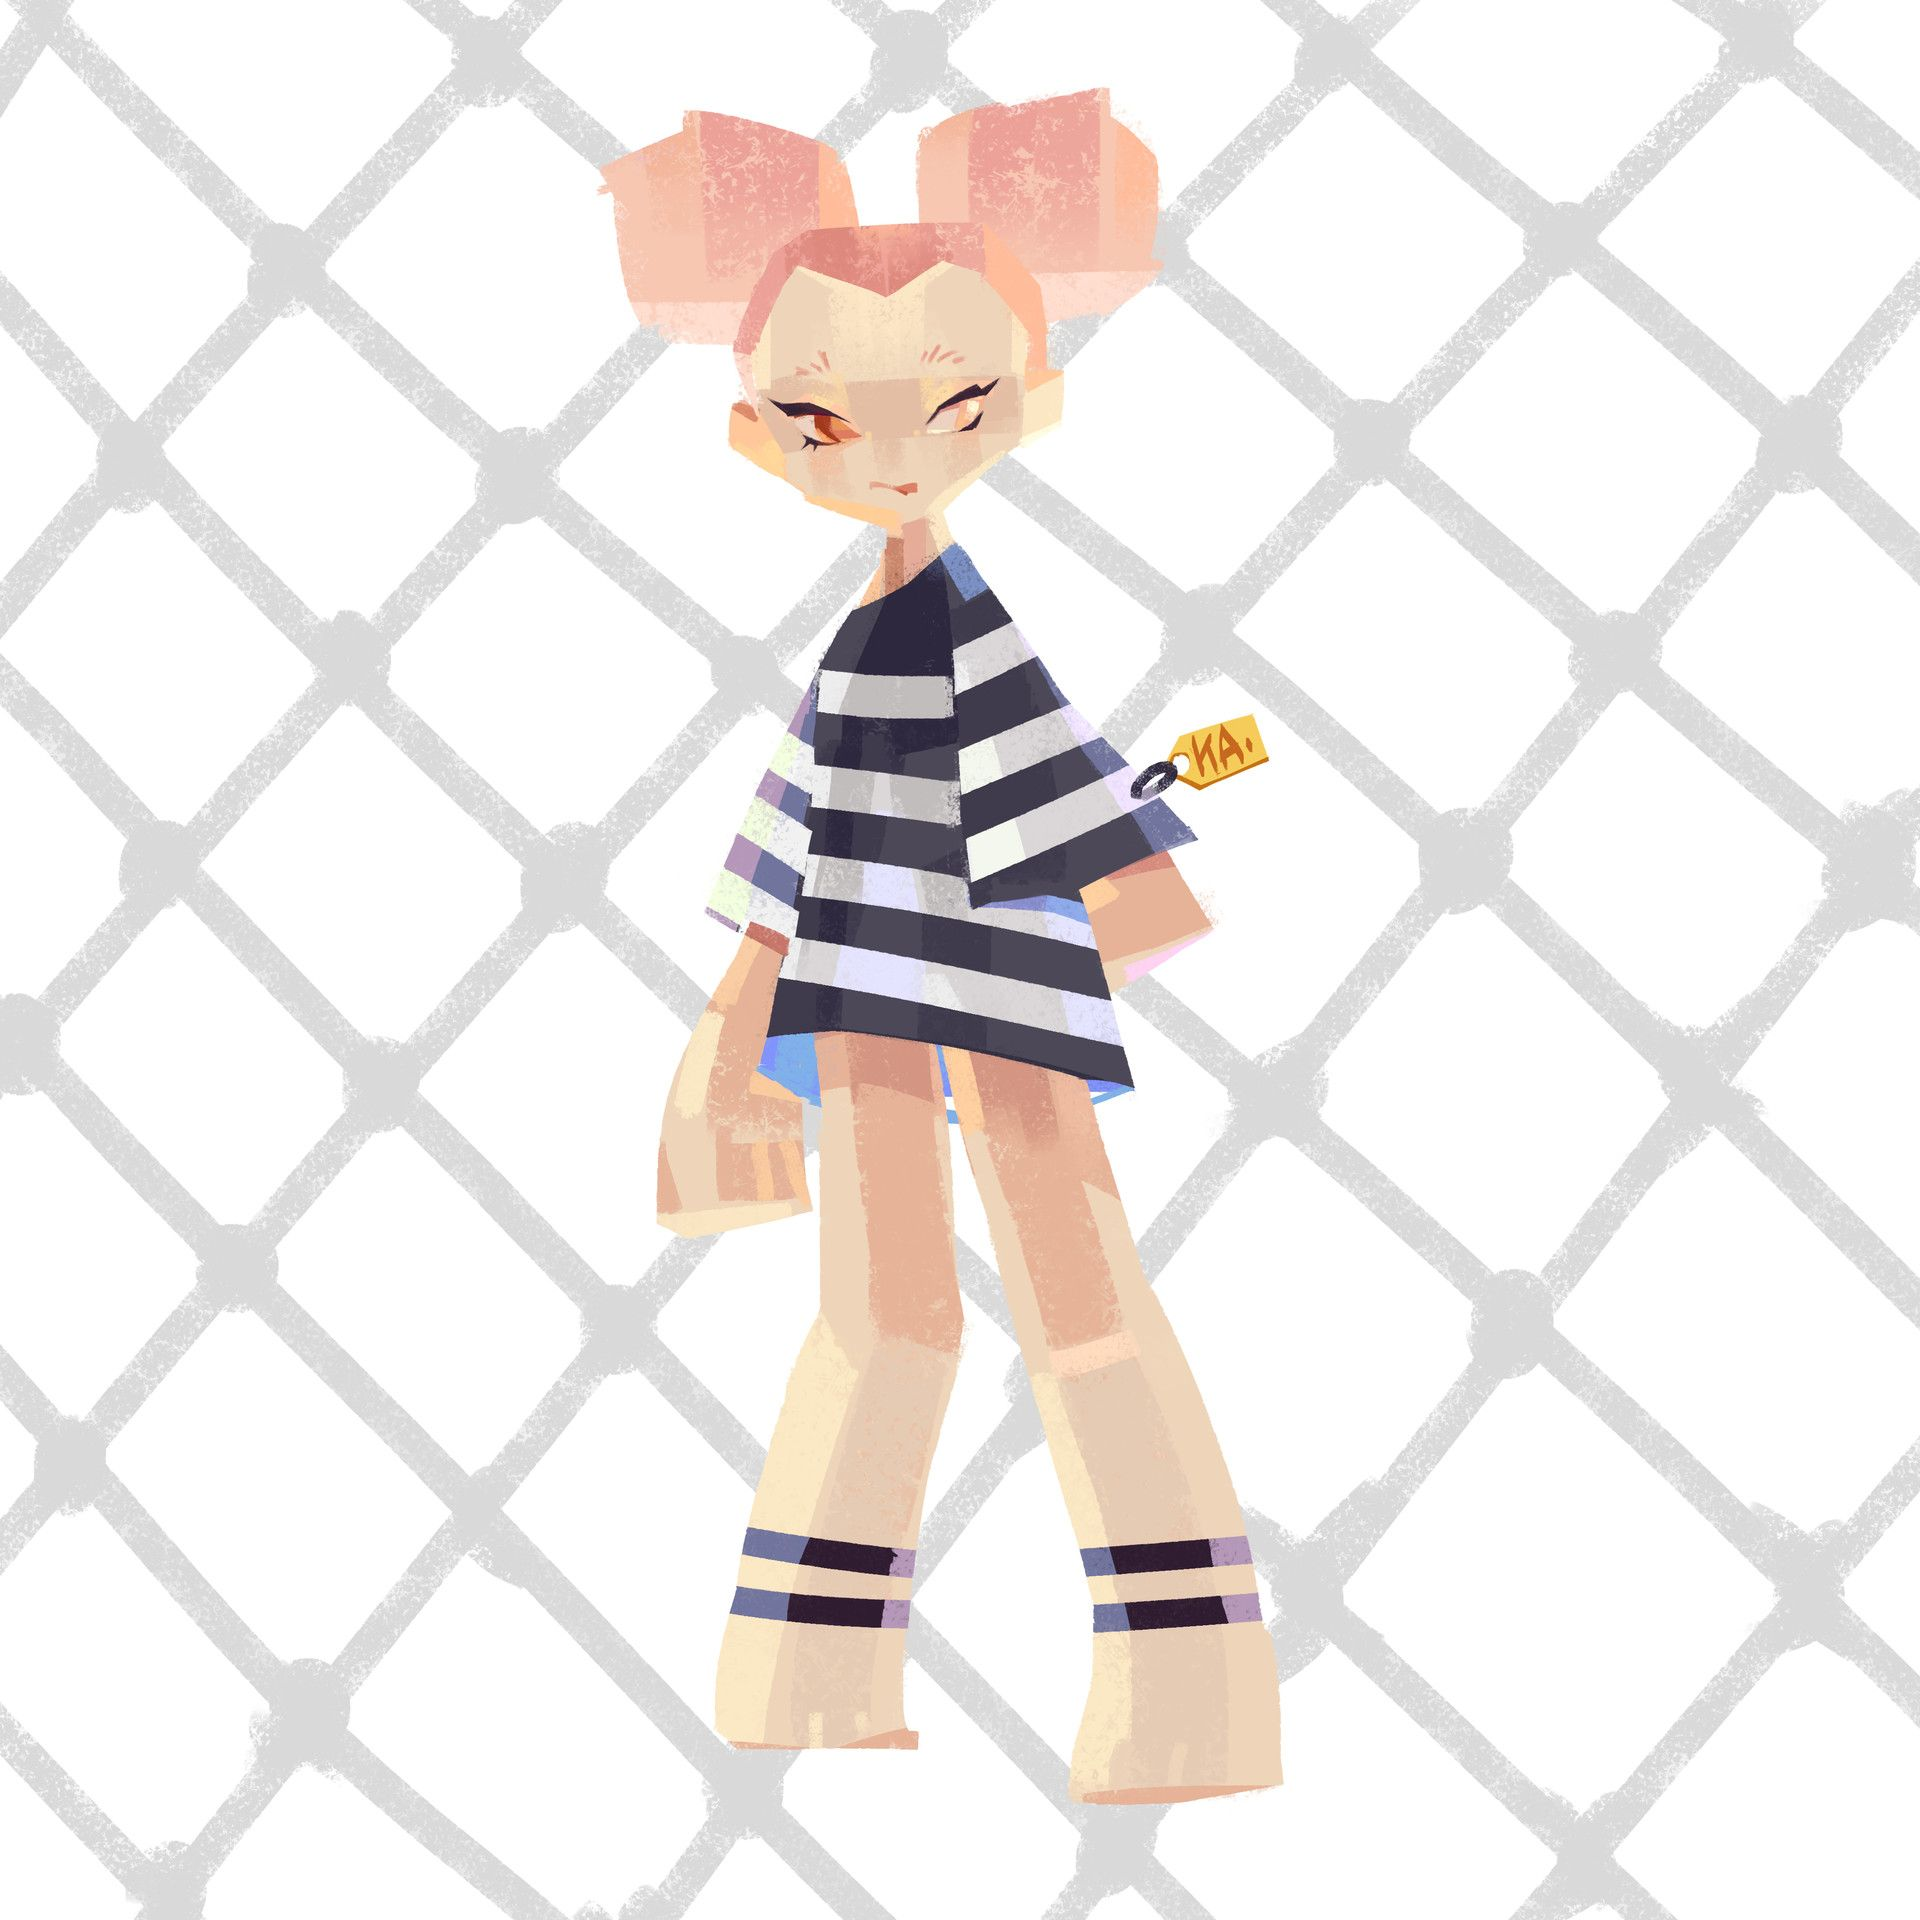 Pinky@BLOODY STREET by kakar cheung on ArtStation.